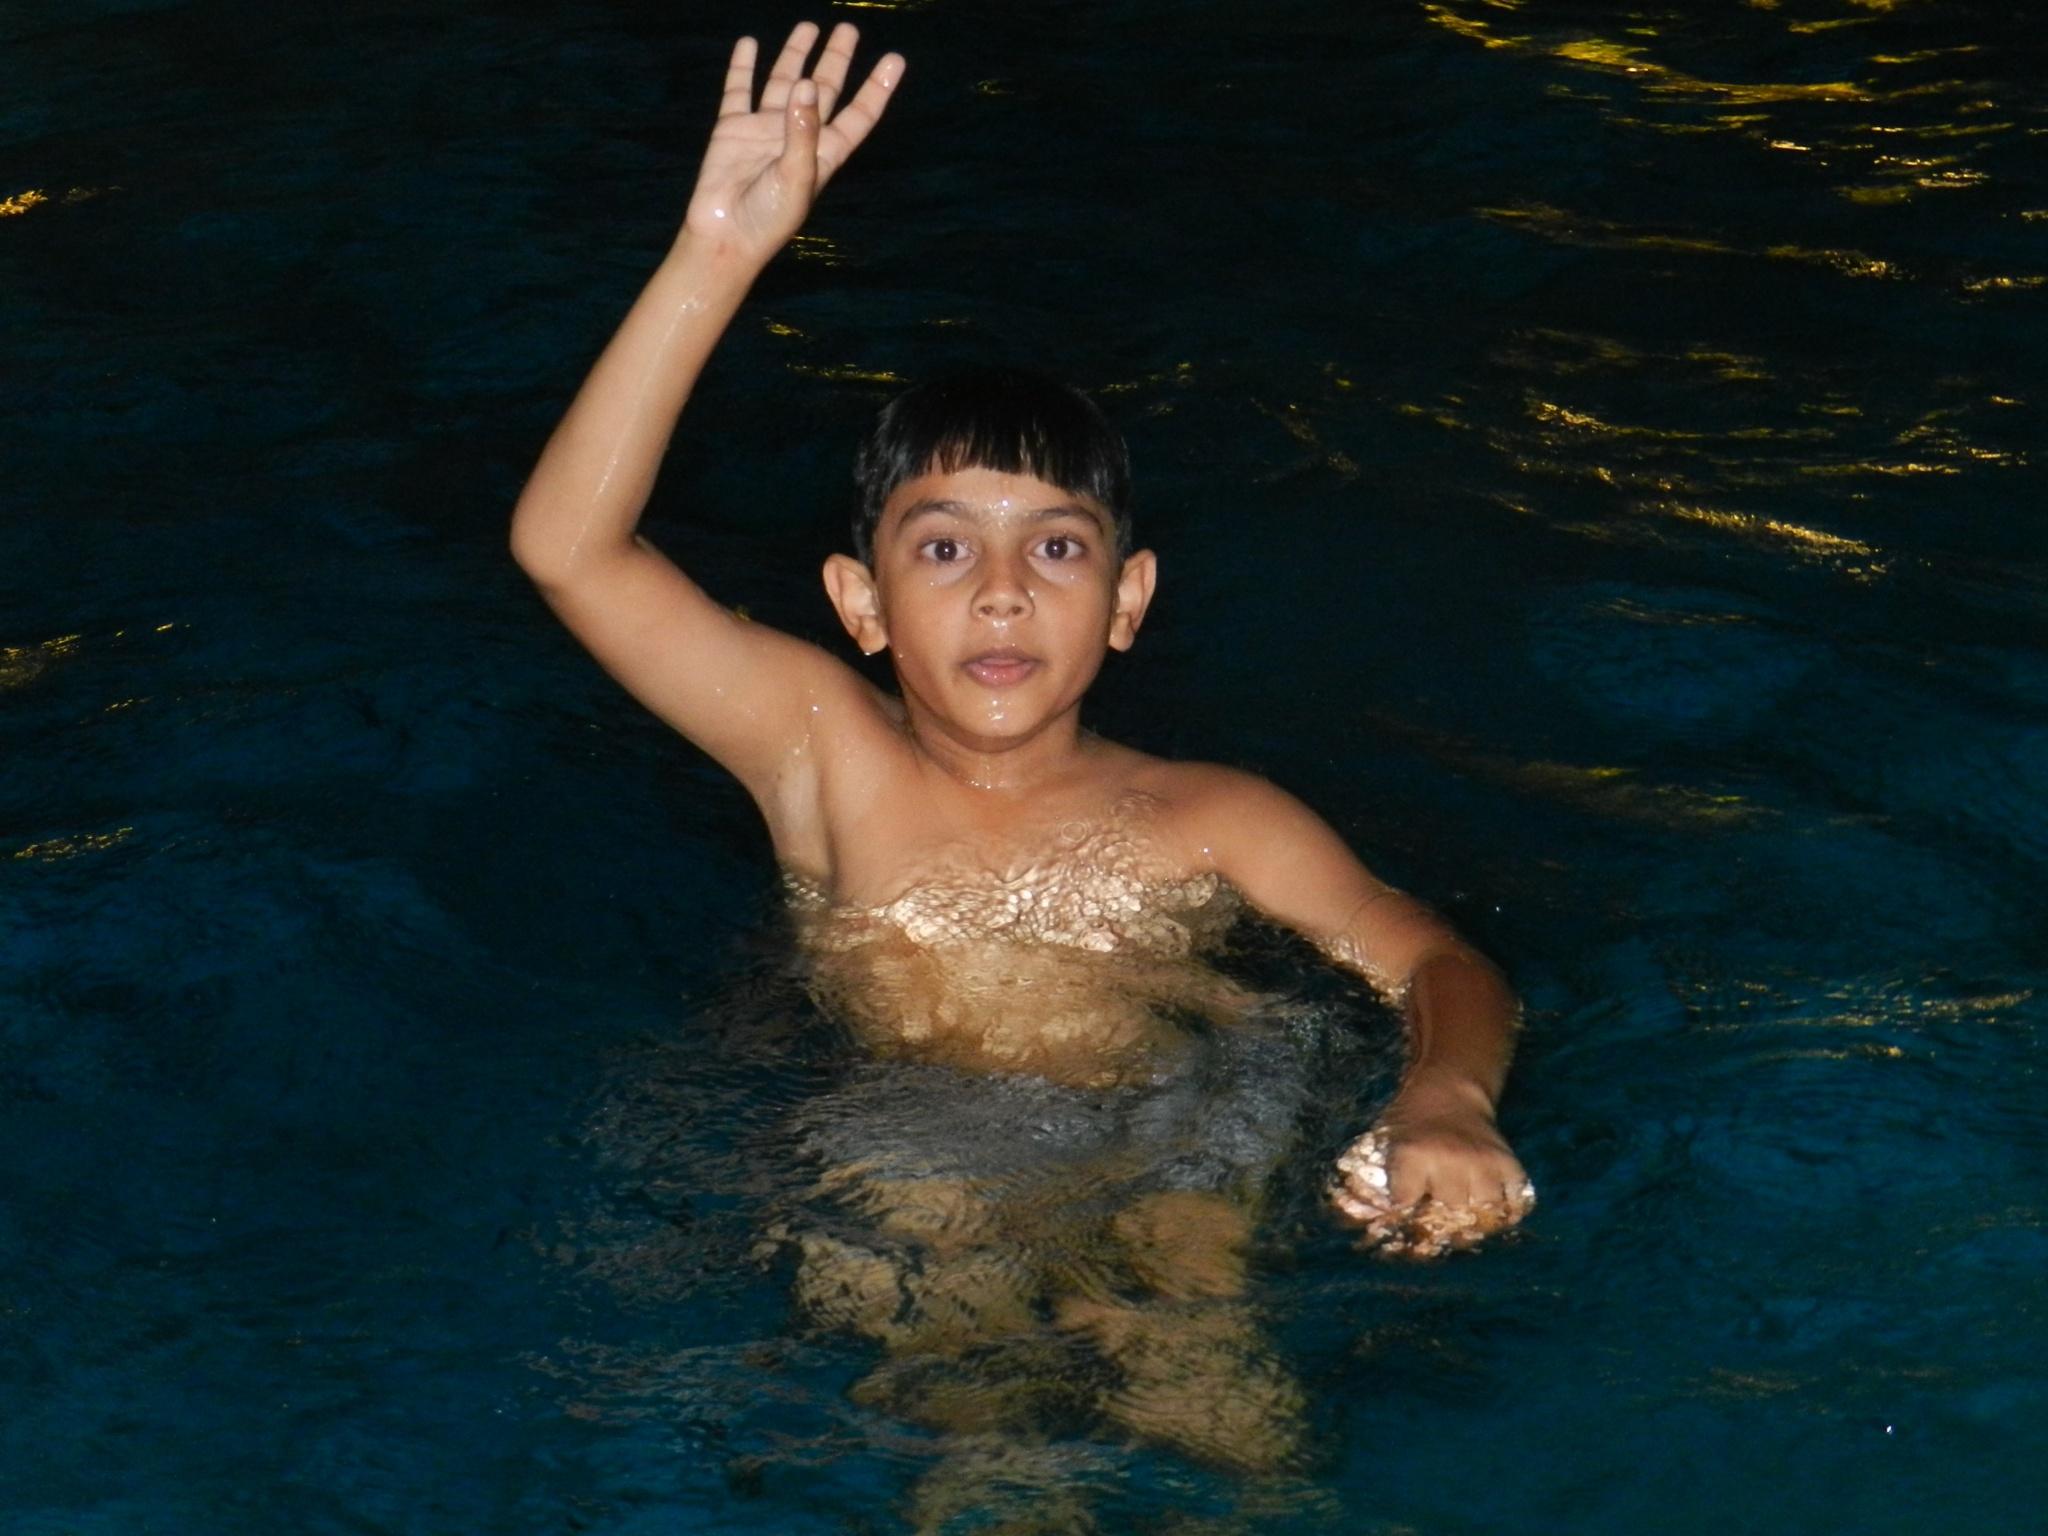 Funtime in pool by Shrenik Dodhia